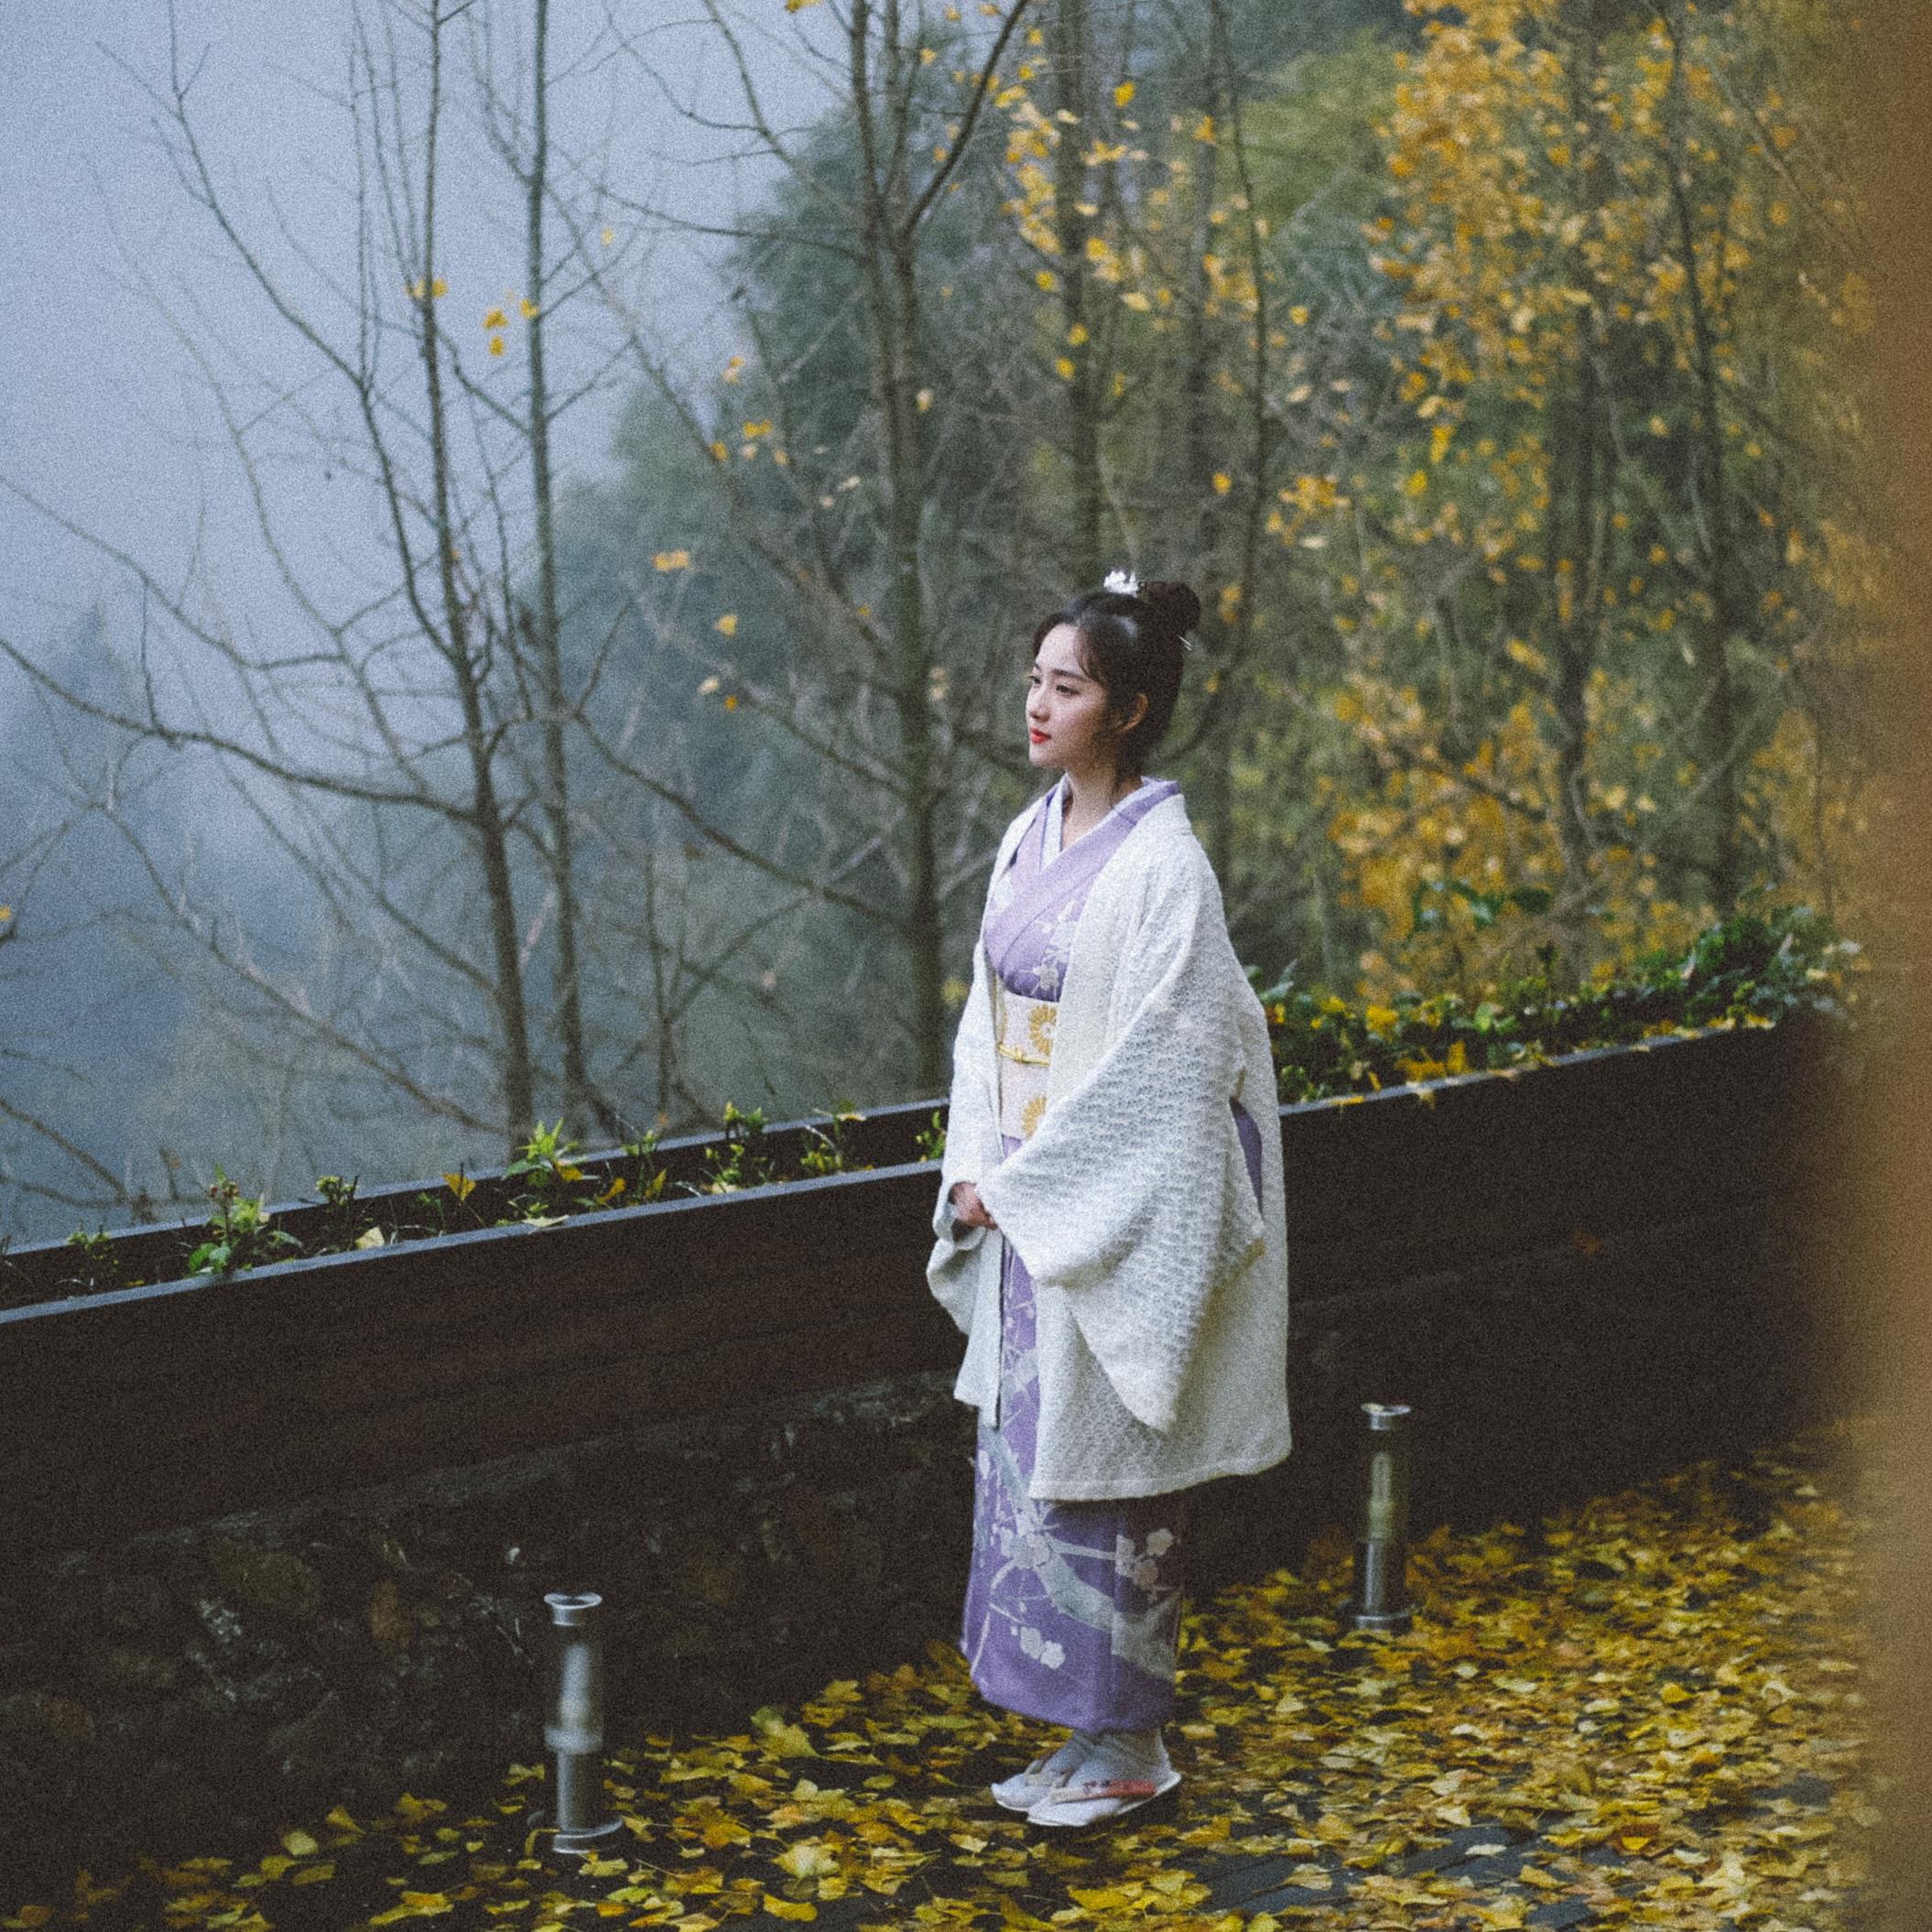 Elegante blanco Kimono para chicas abrigo primavera otoño estilo japonés prendas de vestir manga larga chaqueta de las mujeres del traje de Cosplay de un tamaño